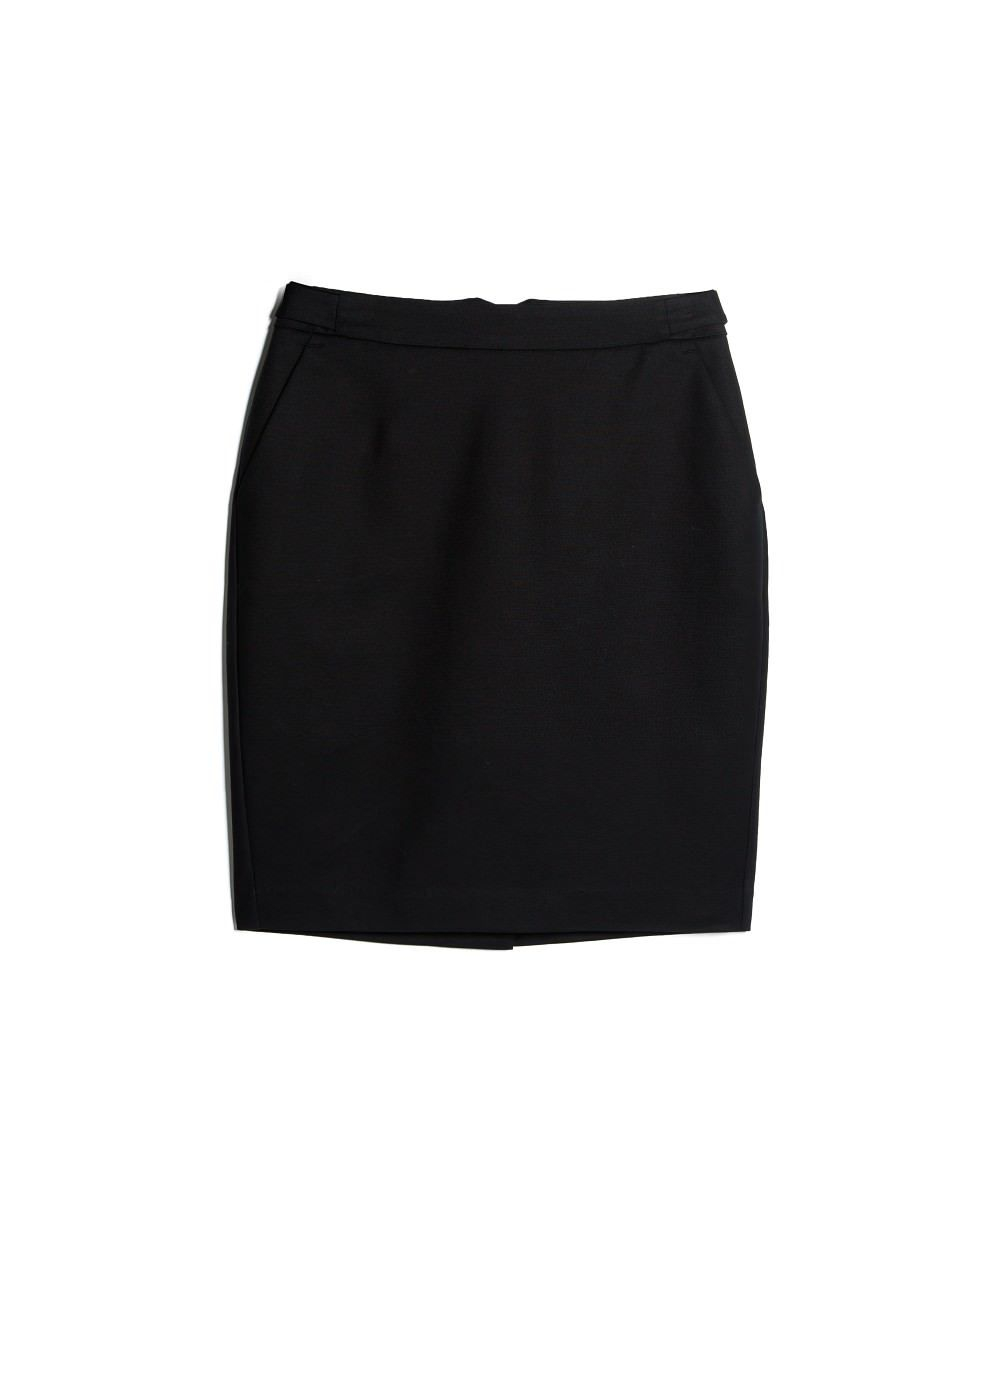 Black Cotton Skirt - Skirts